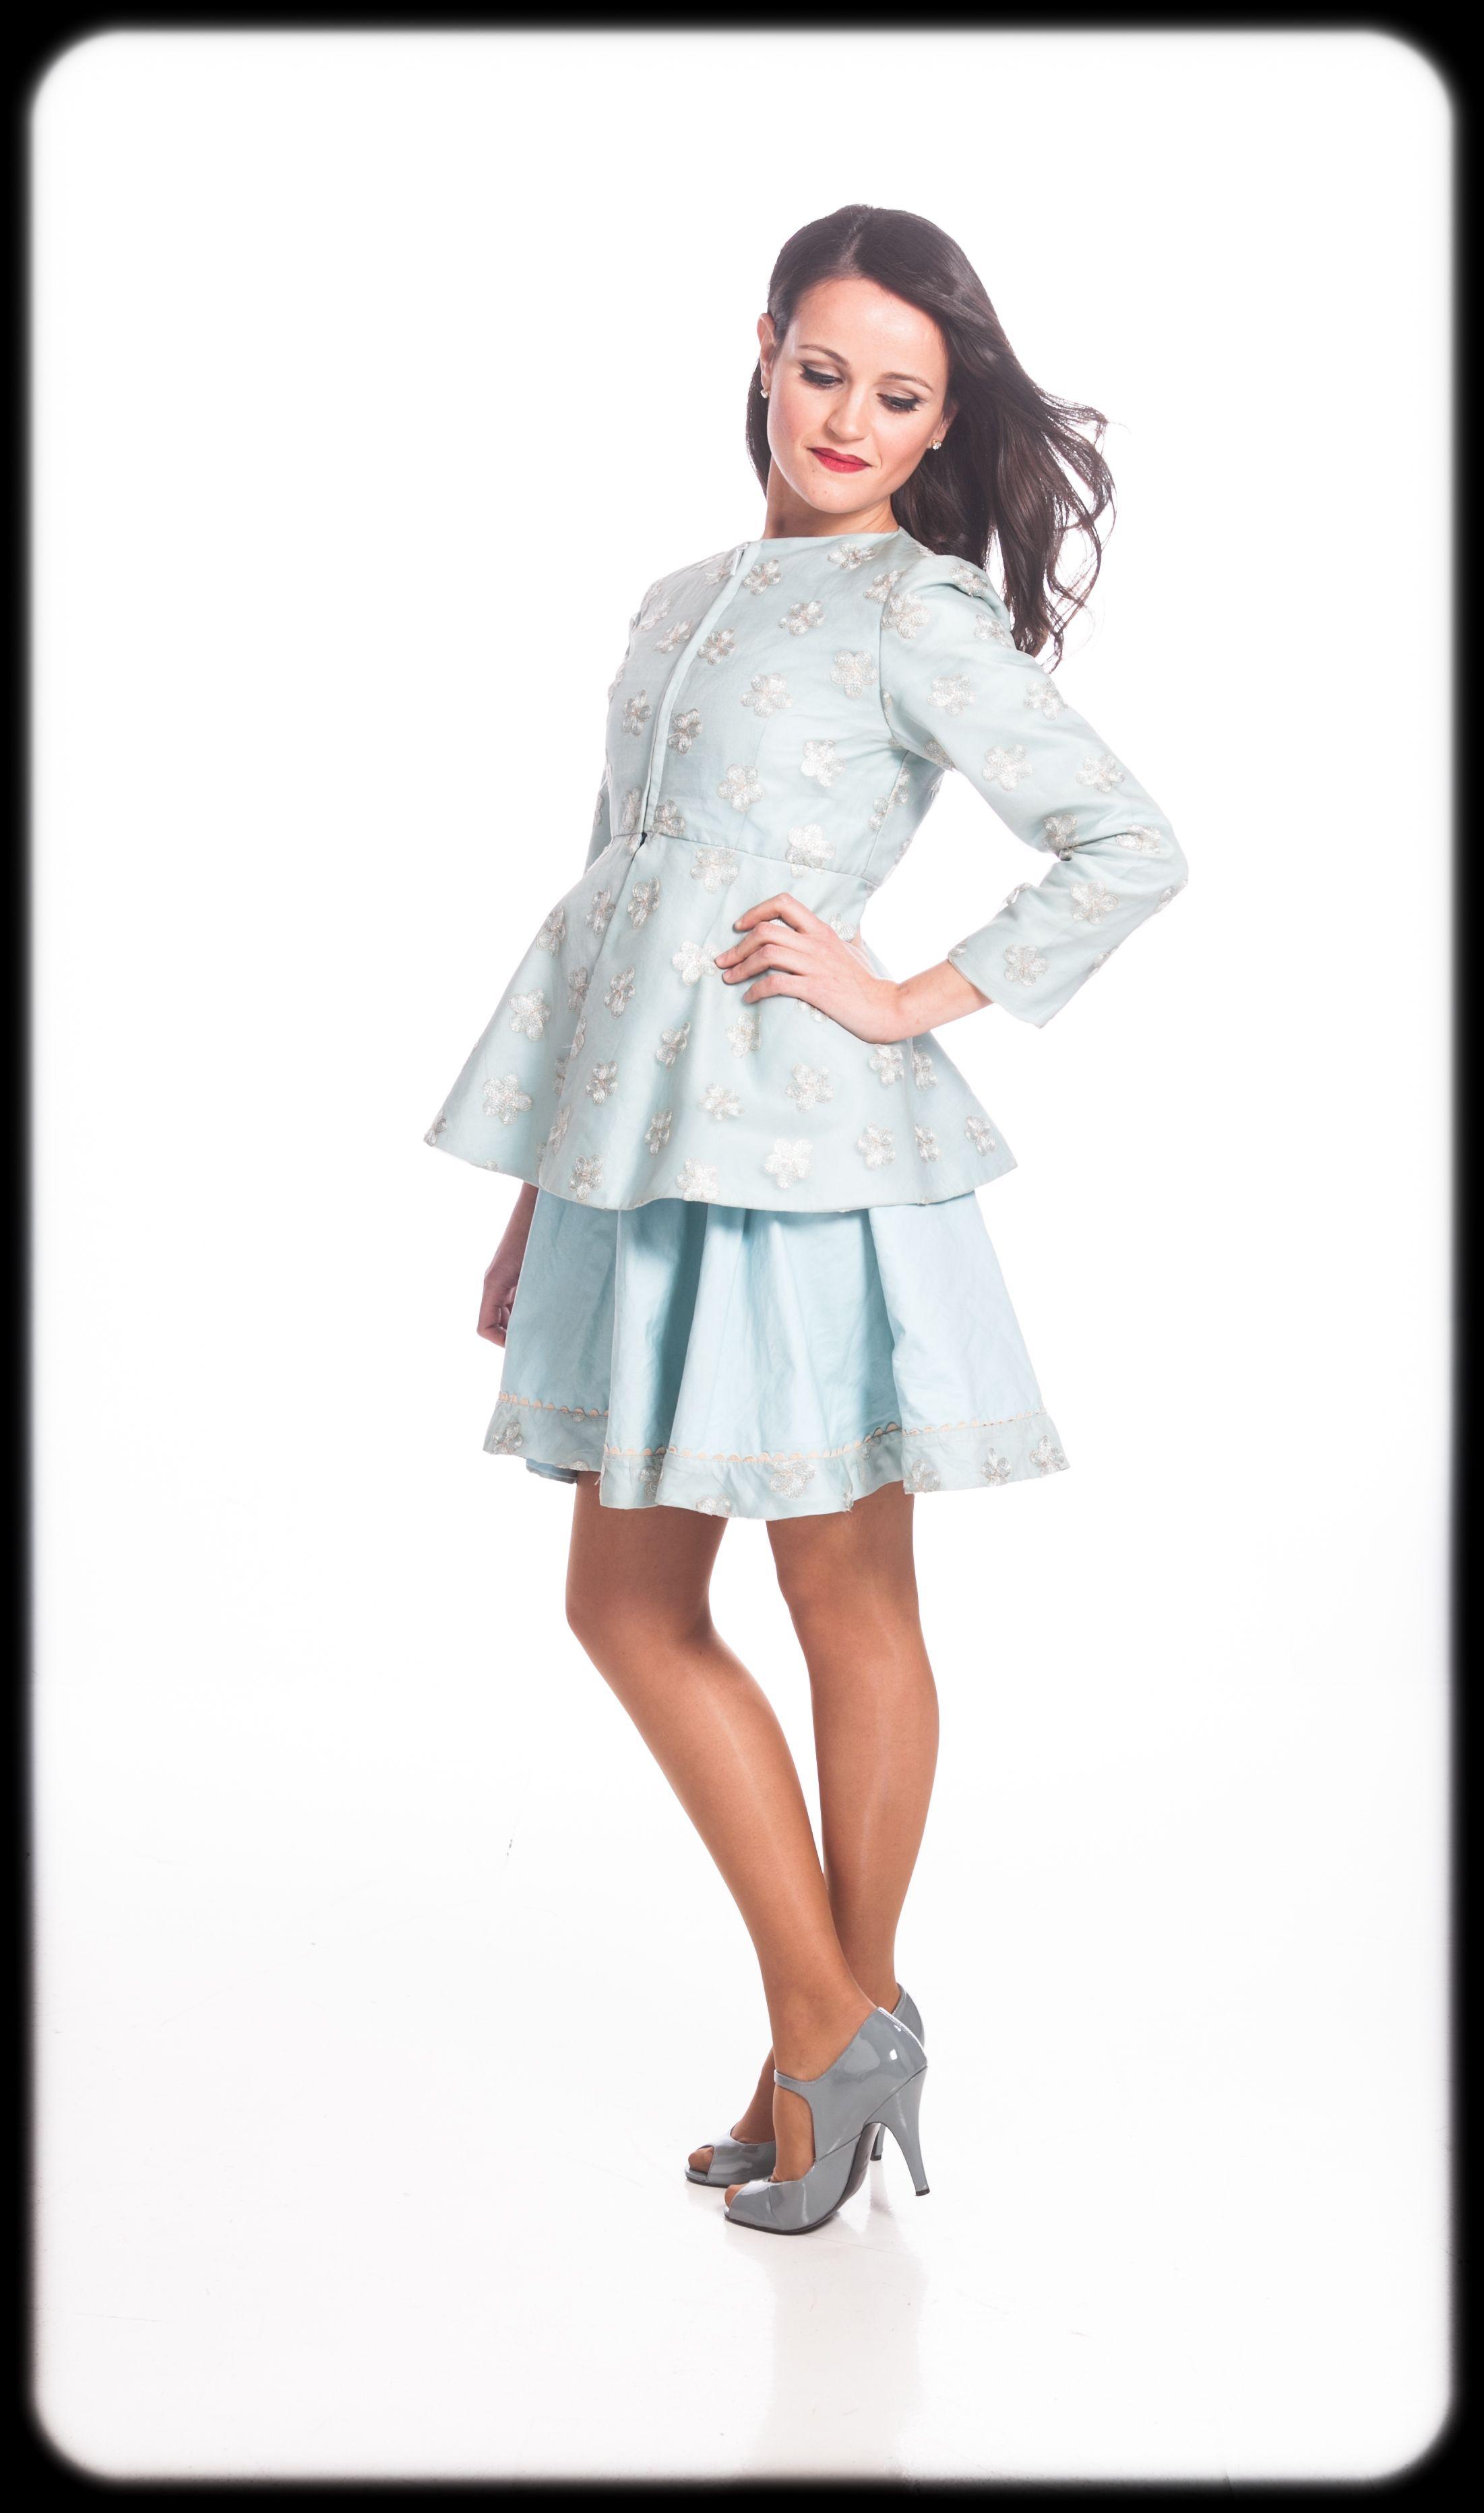 coleccion alta costura Mª JOSE ORTIZ  info@candidas.es